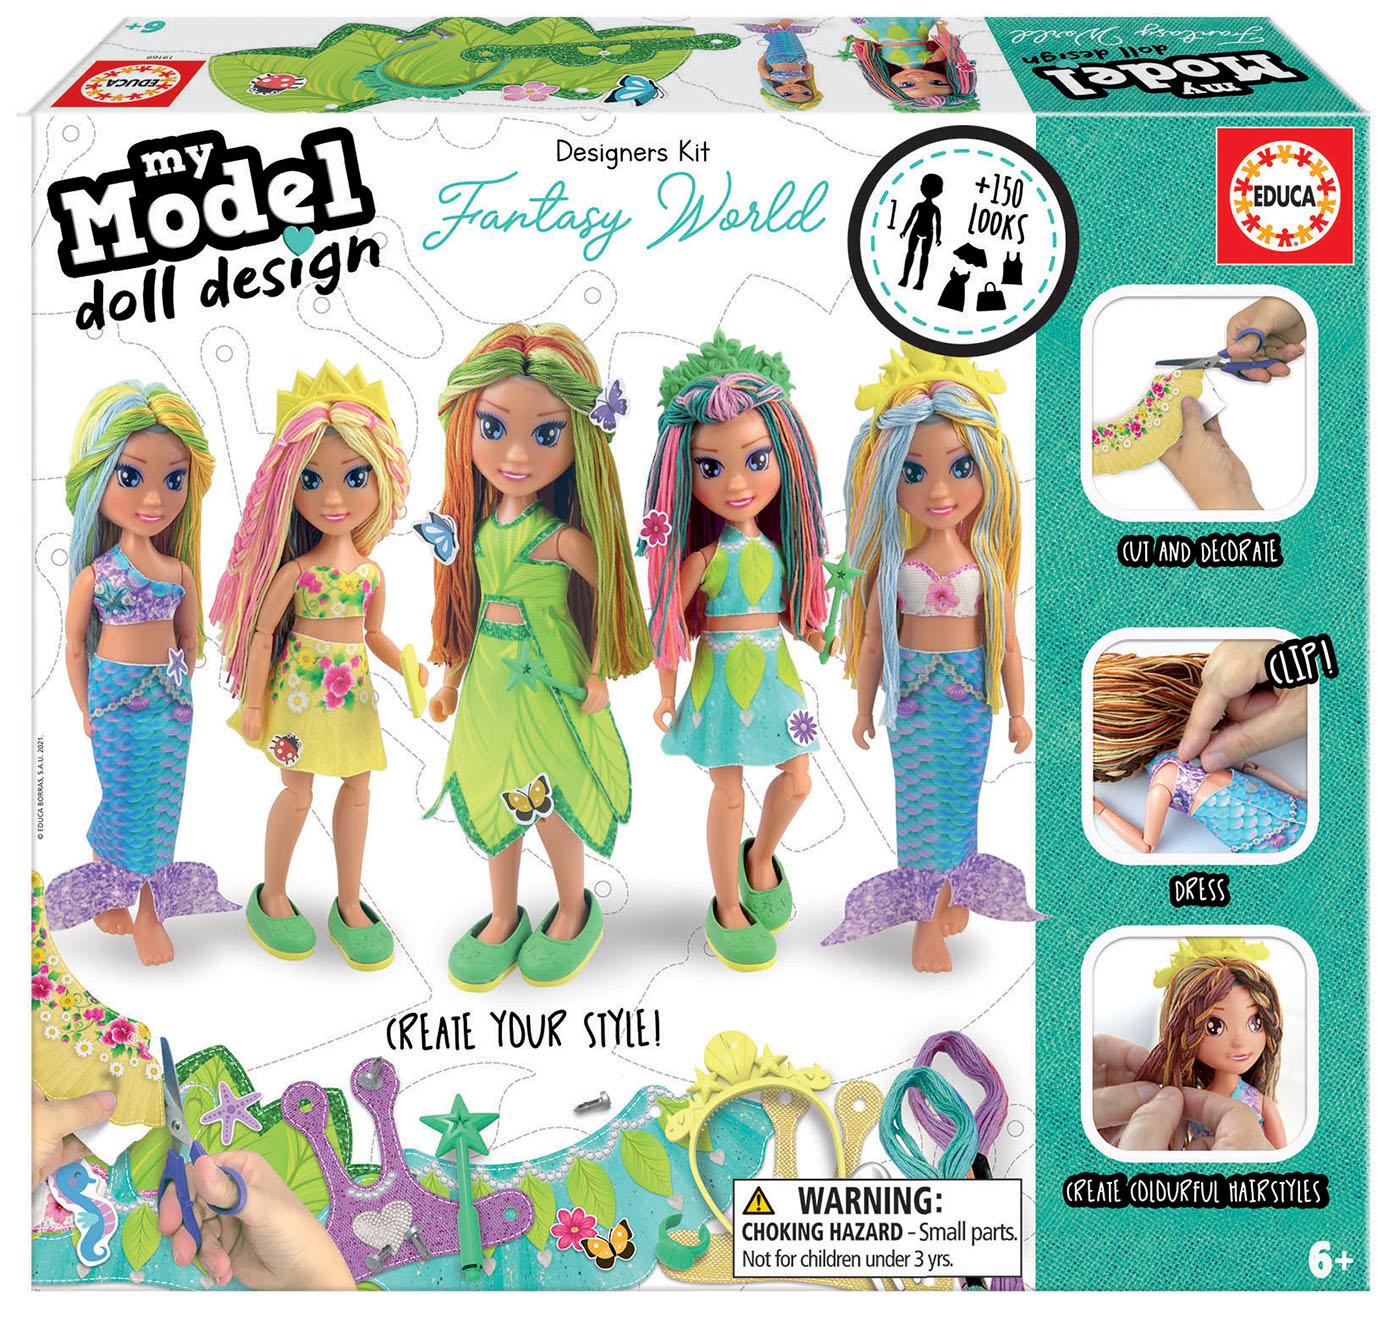 Design Your Doll Fantasy World